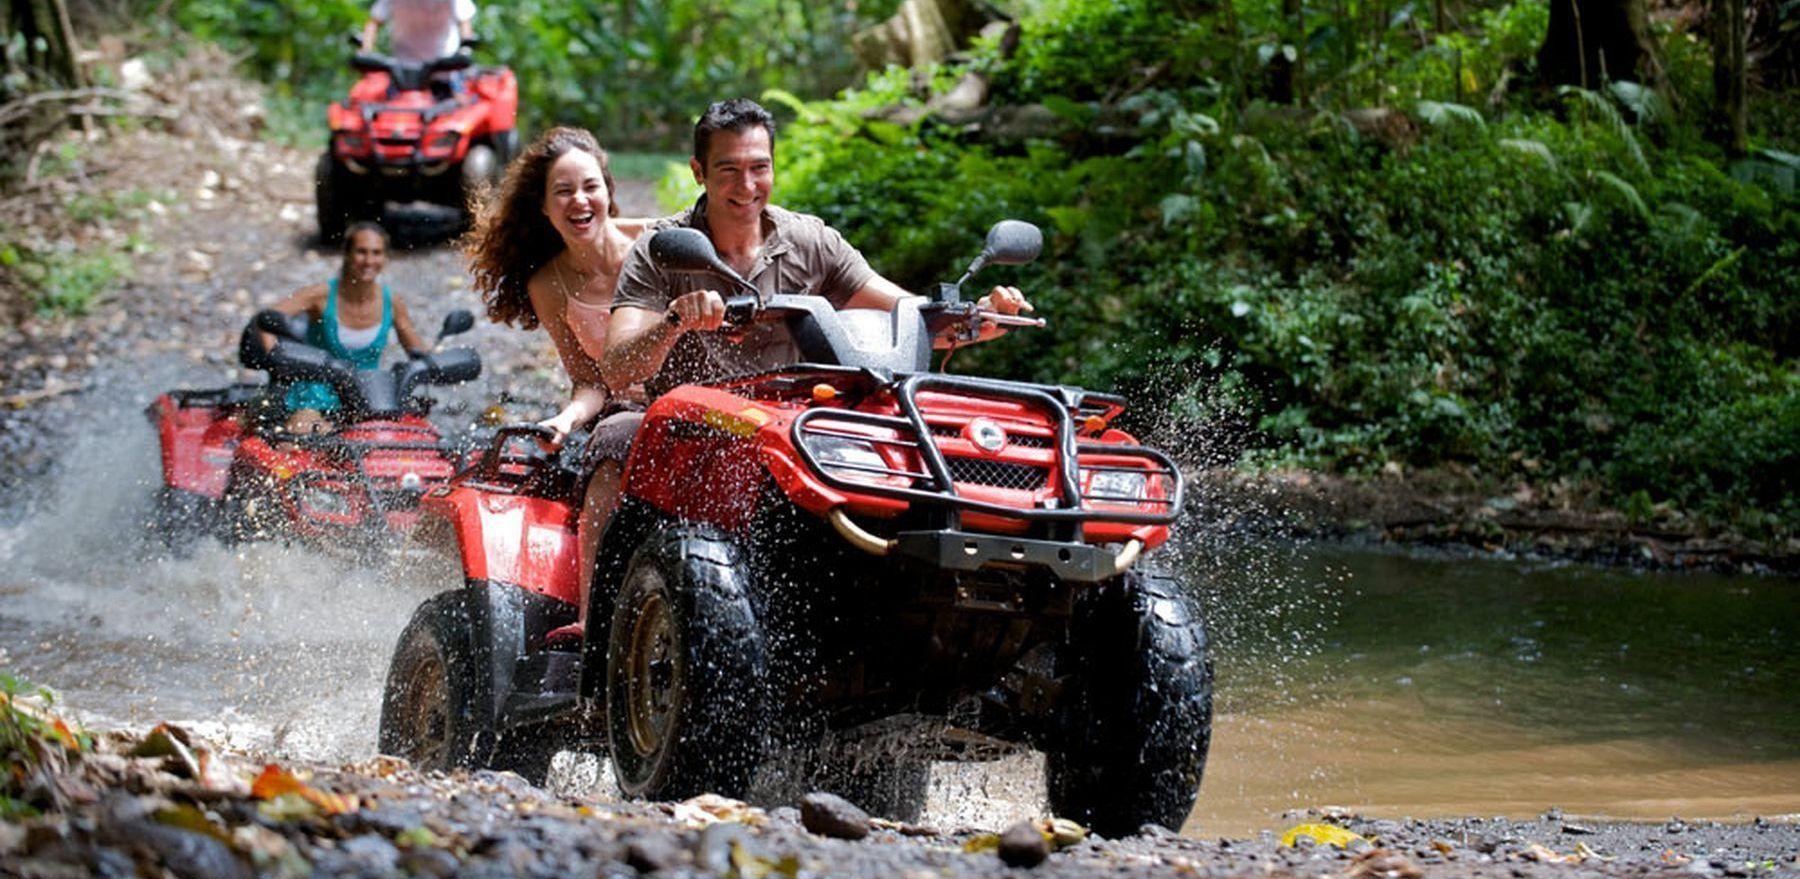 ATV excursion near Las Terrenas, Samana